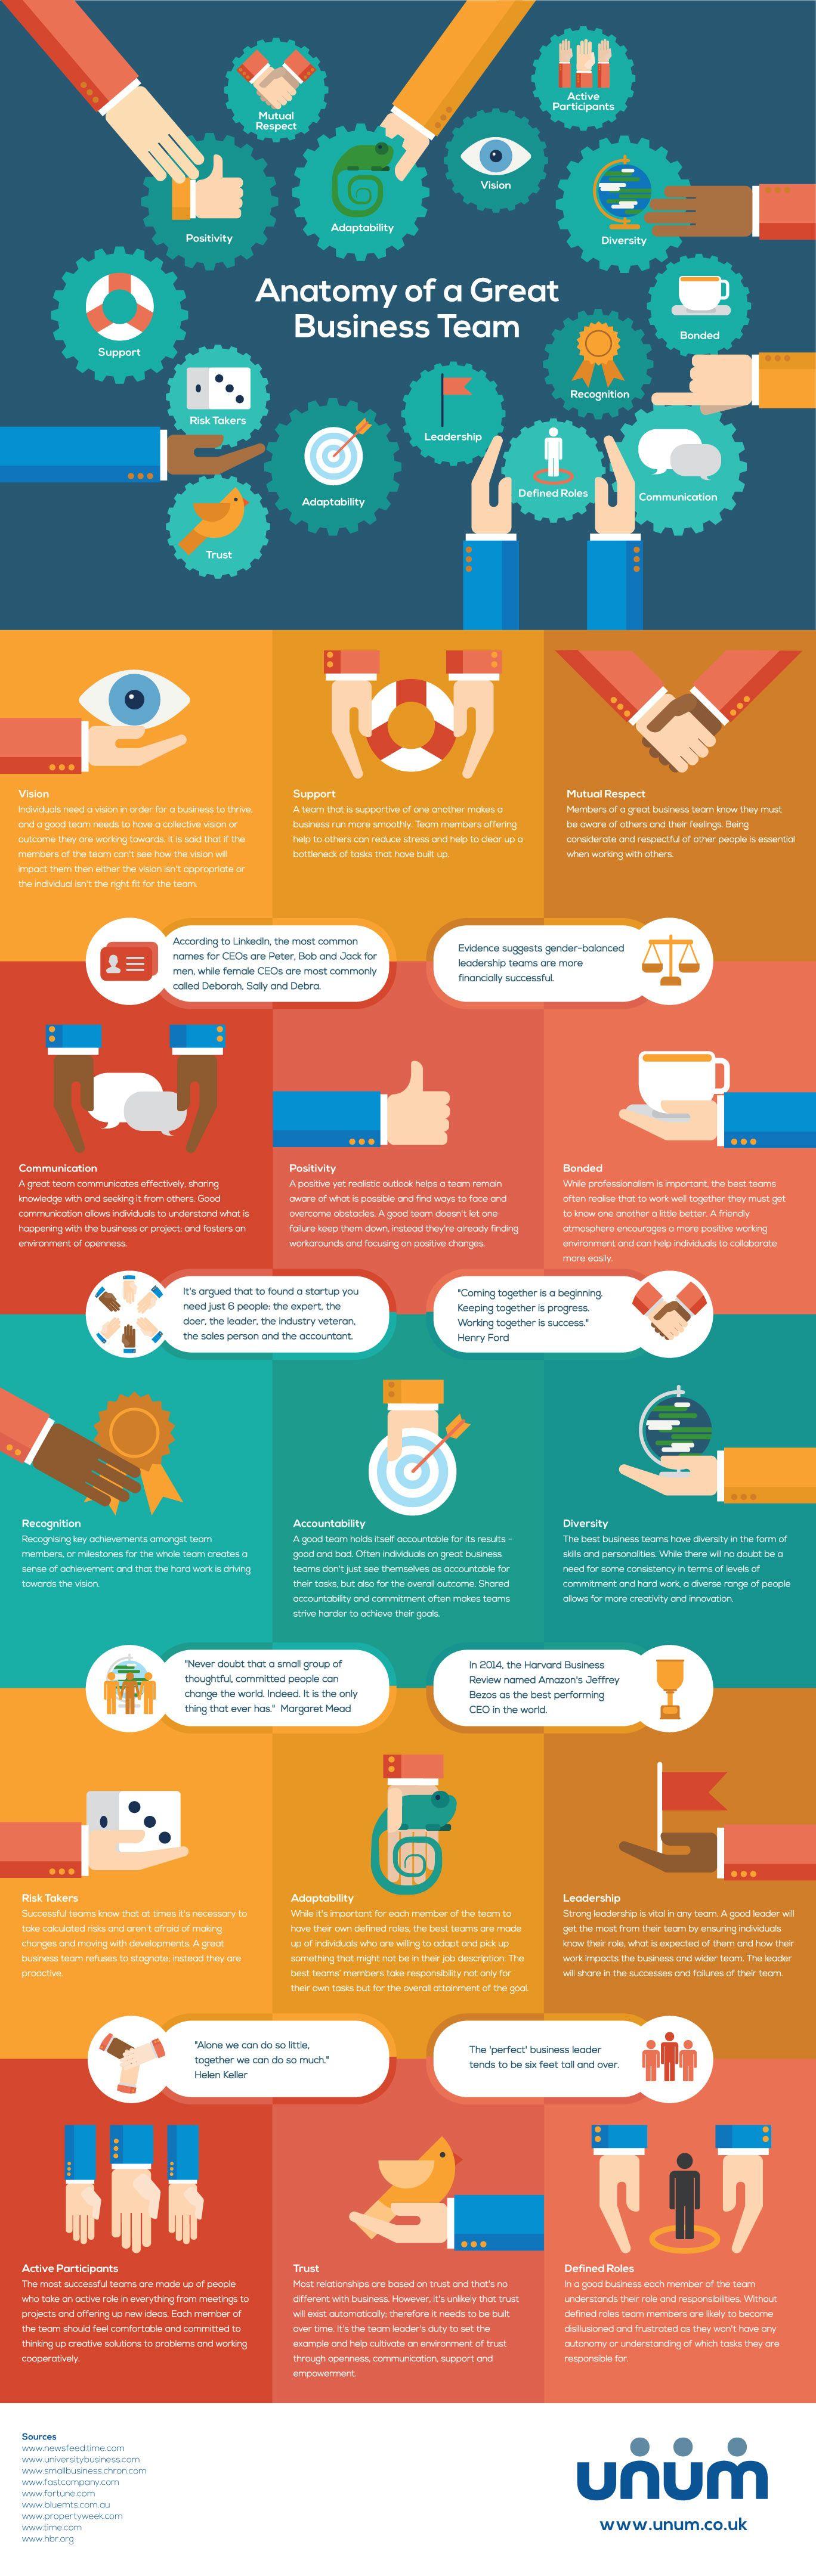 15 Characteristics of Extraordinary Teams (Infographic) | Anatomy ...